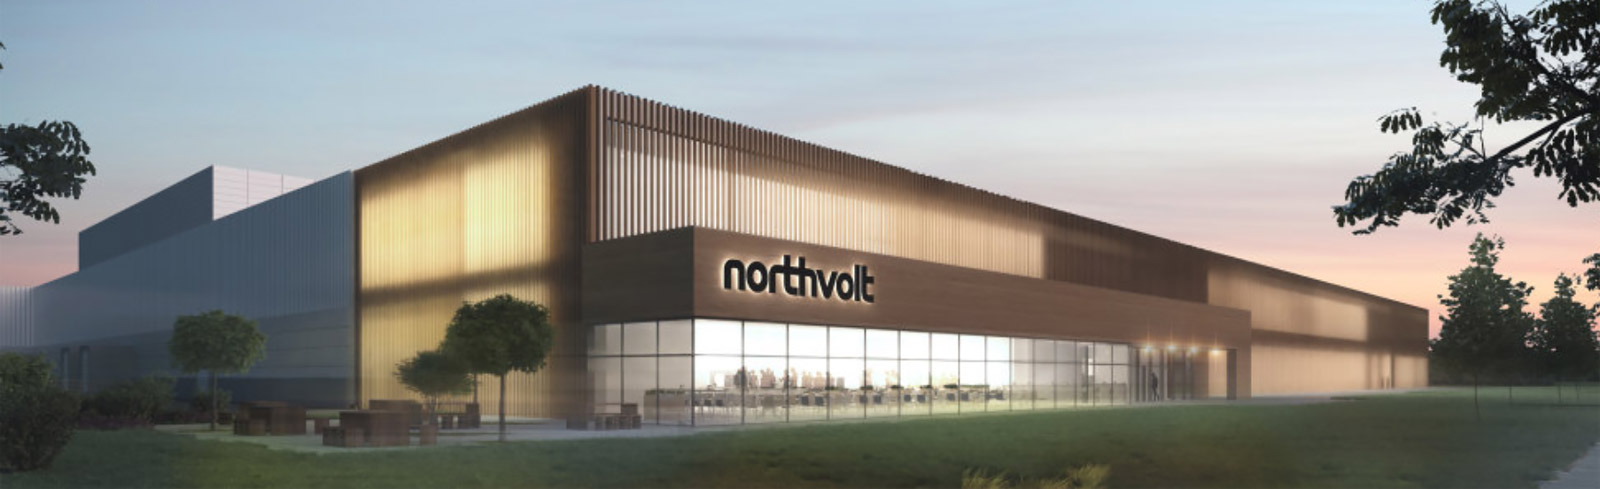 Volkswagen invests 620 million US dollars in Northvolt